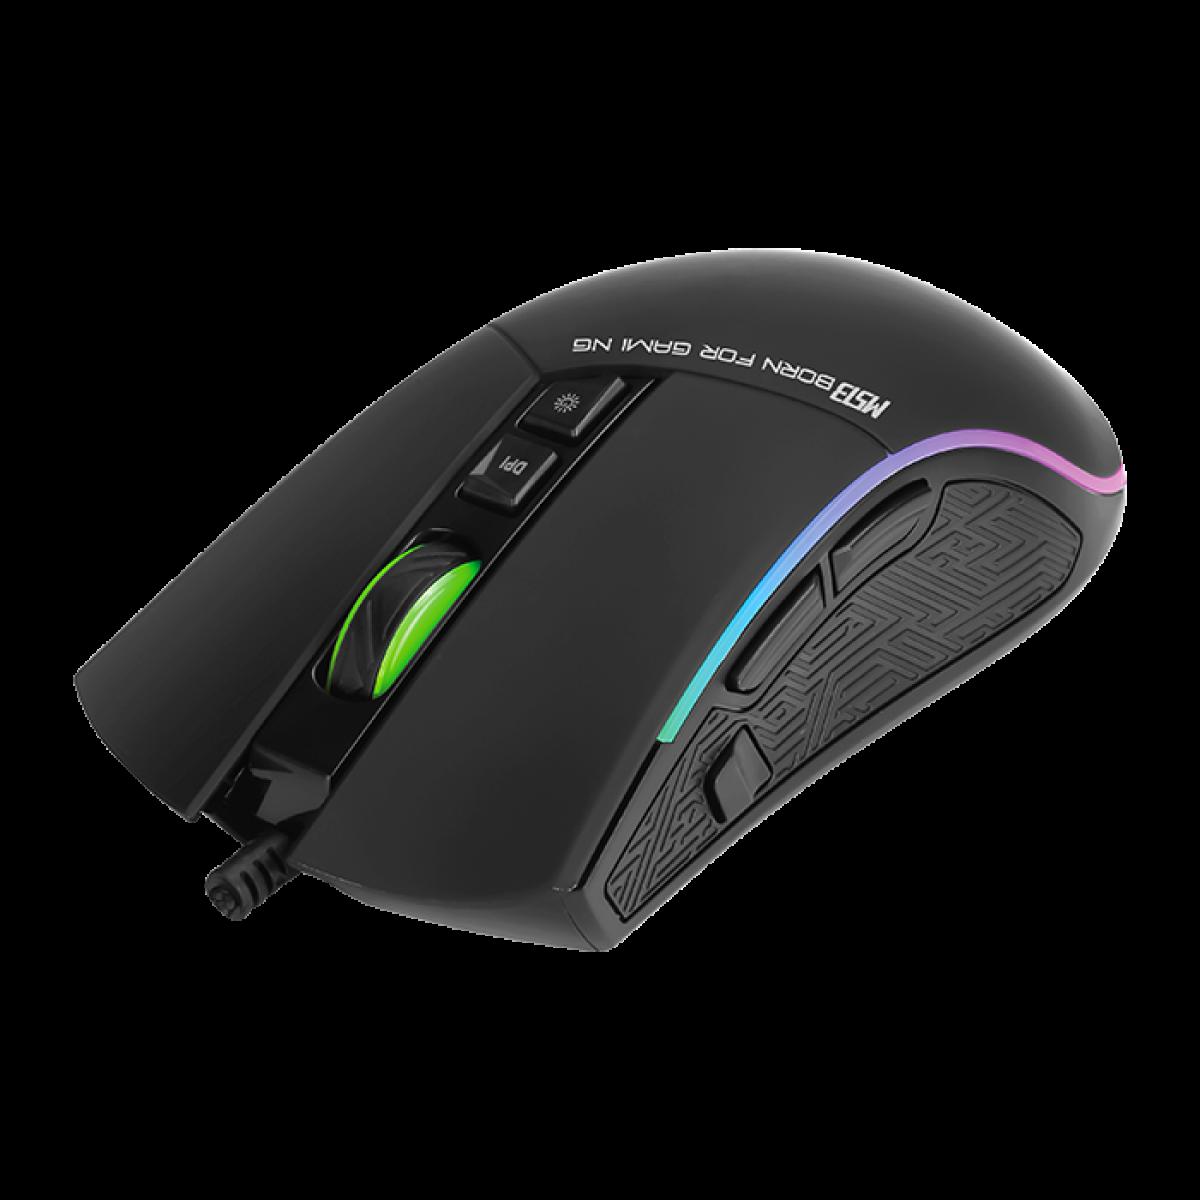 Mouse Marvo Gamer M513 8 Botões 3200 DPI LED Rgb Rainbow